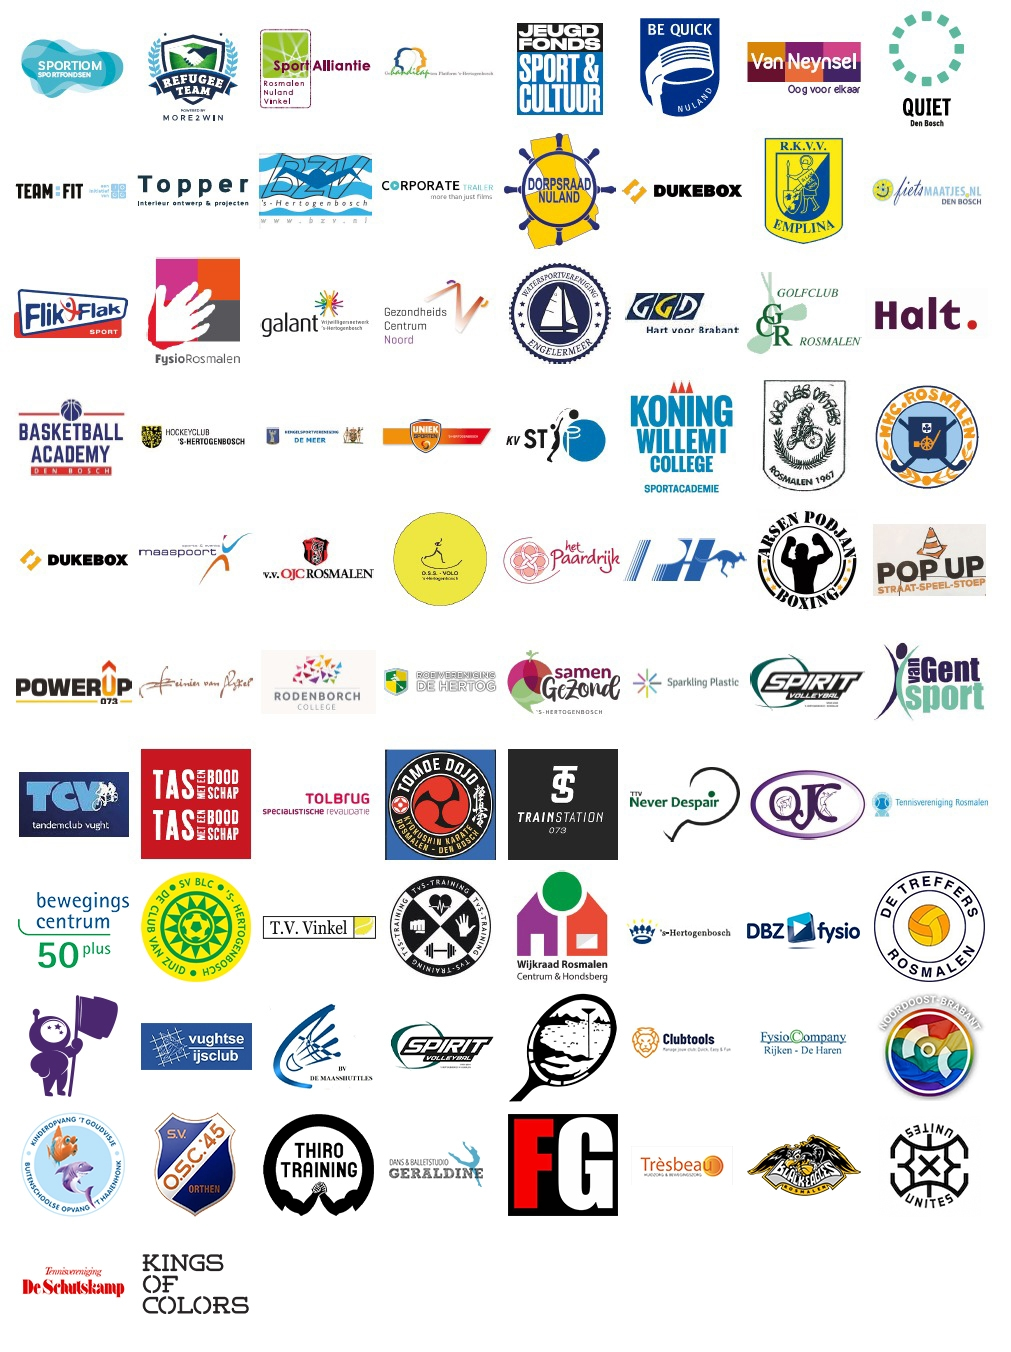 Logos Bosch Sportakkoord 3 5 2021